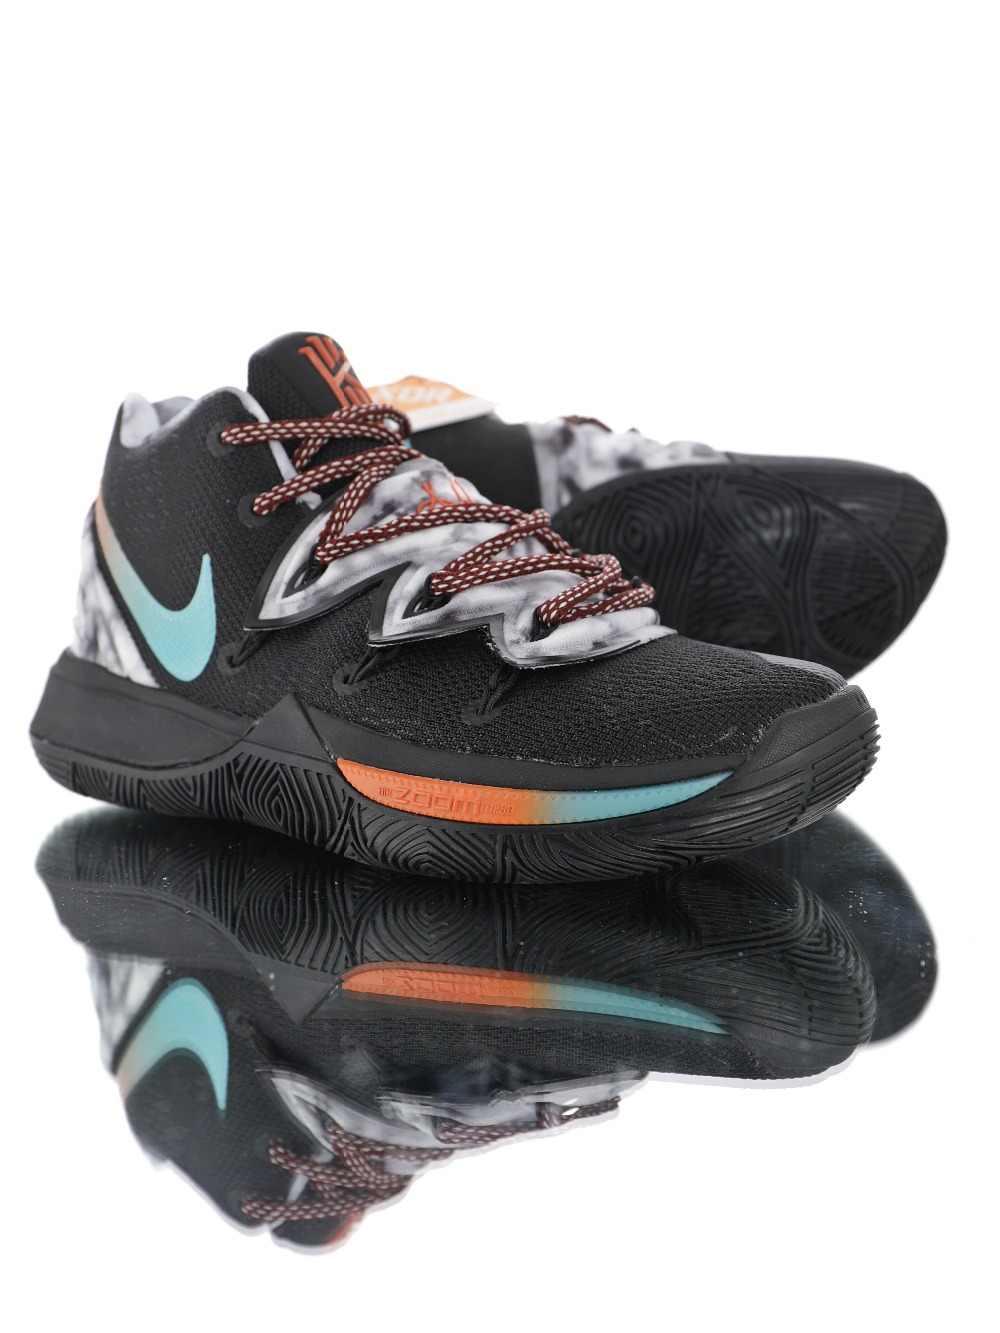 e490e9dc5ea0 Detail Feedback Questions about Original Nike Kyrie 5 Generation ...